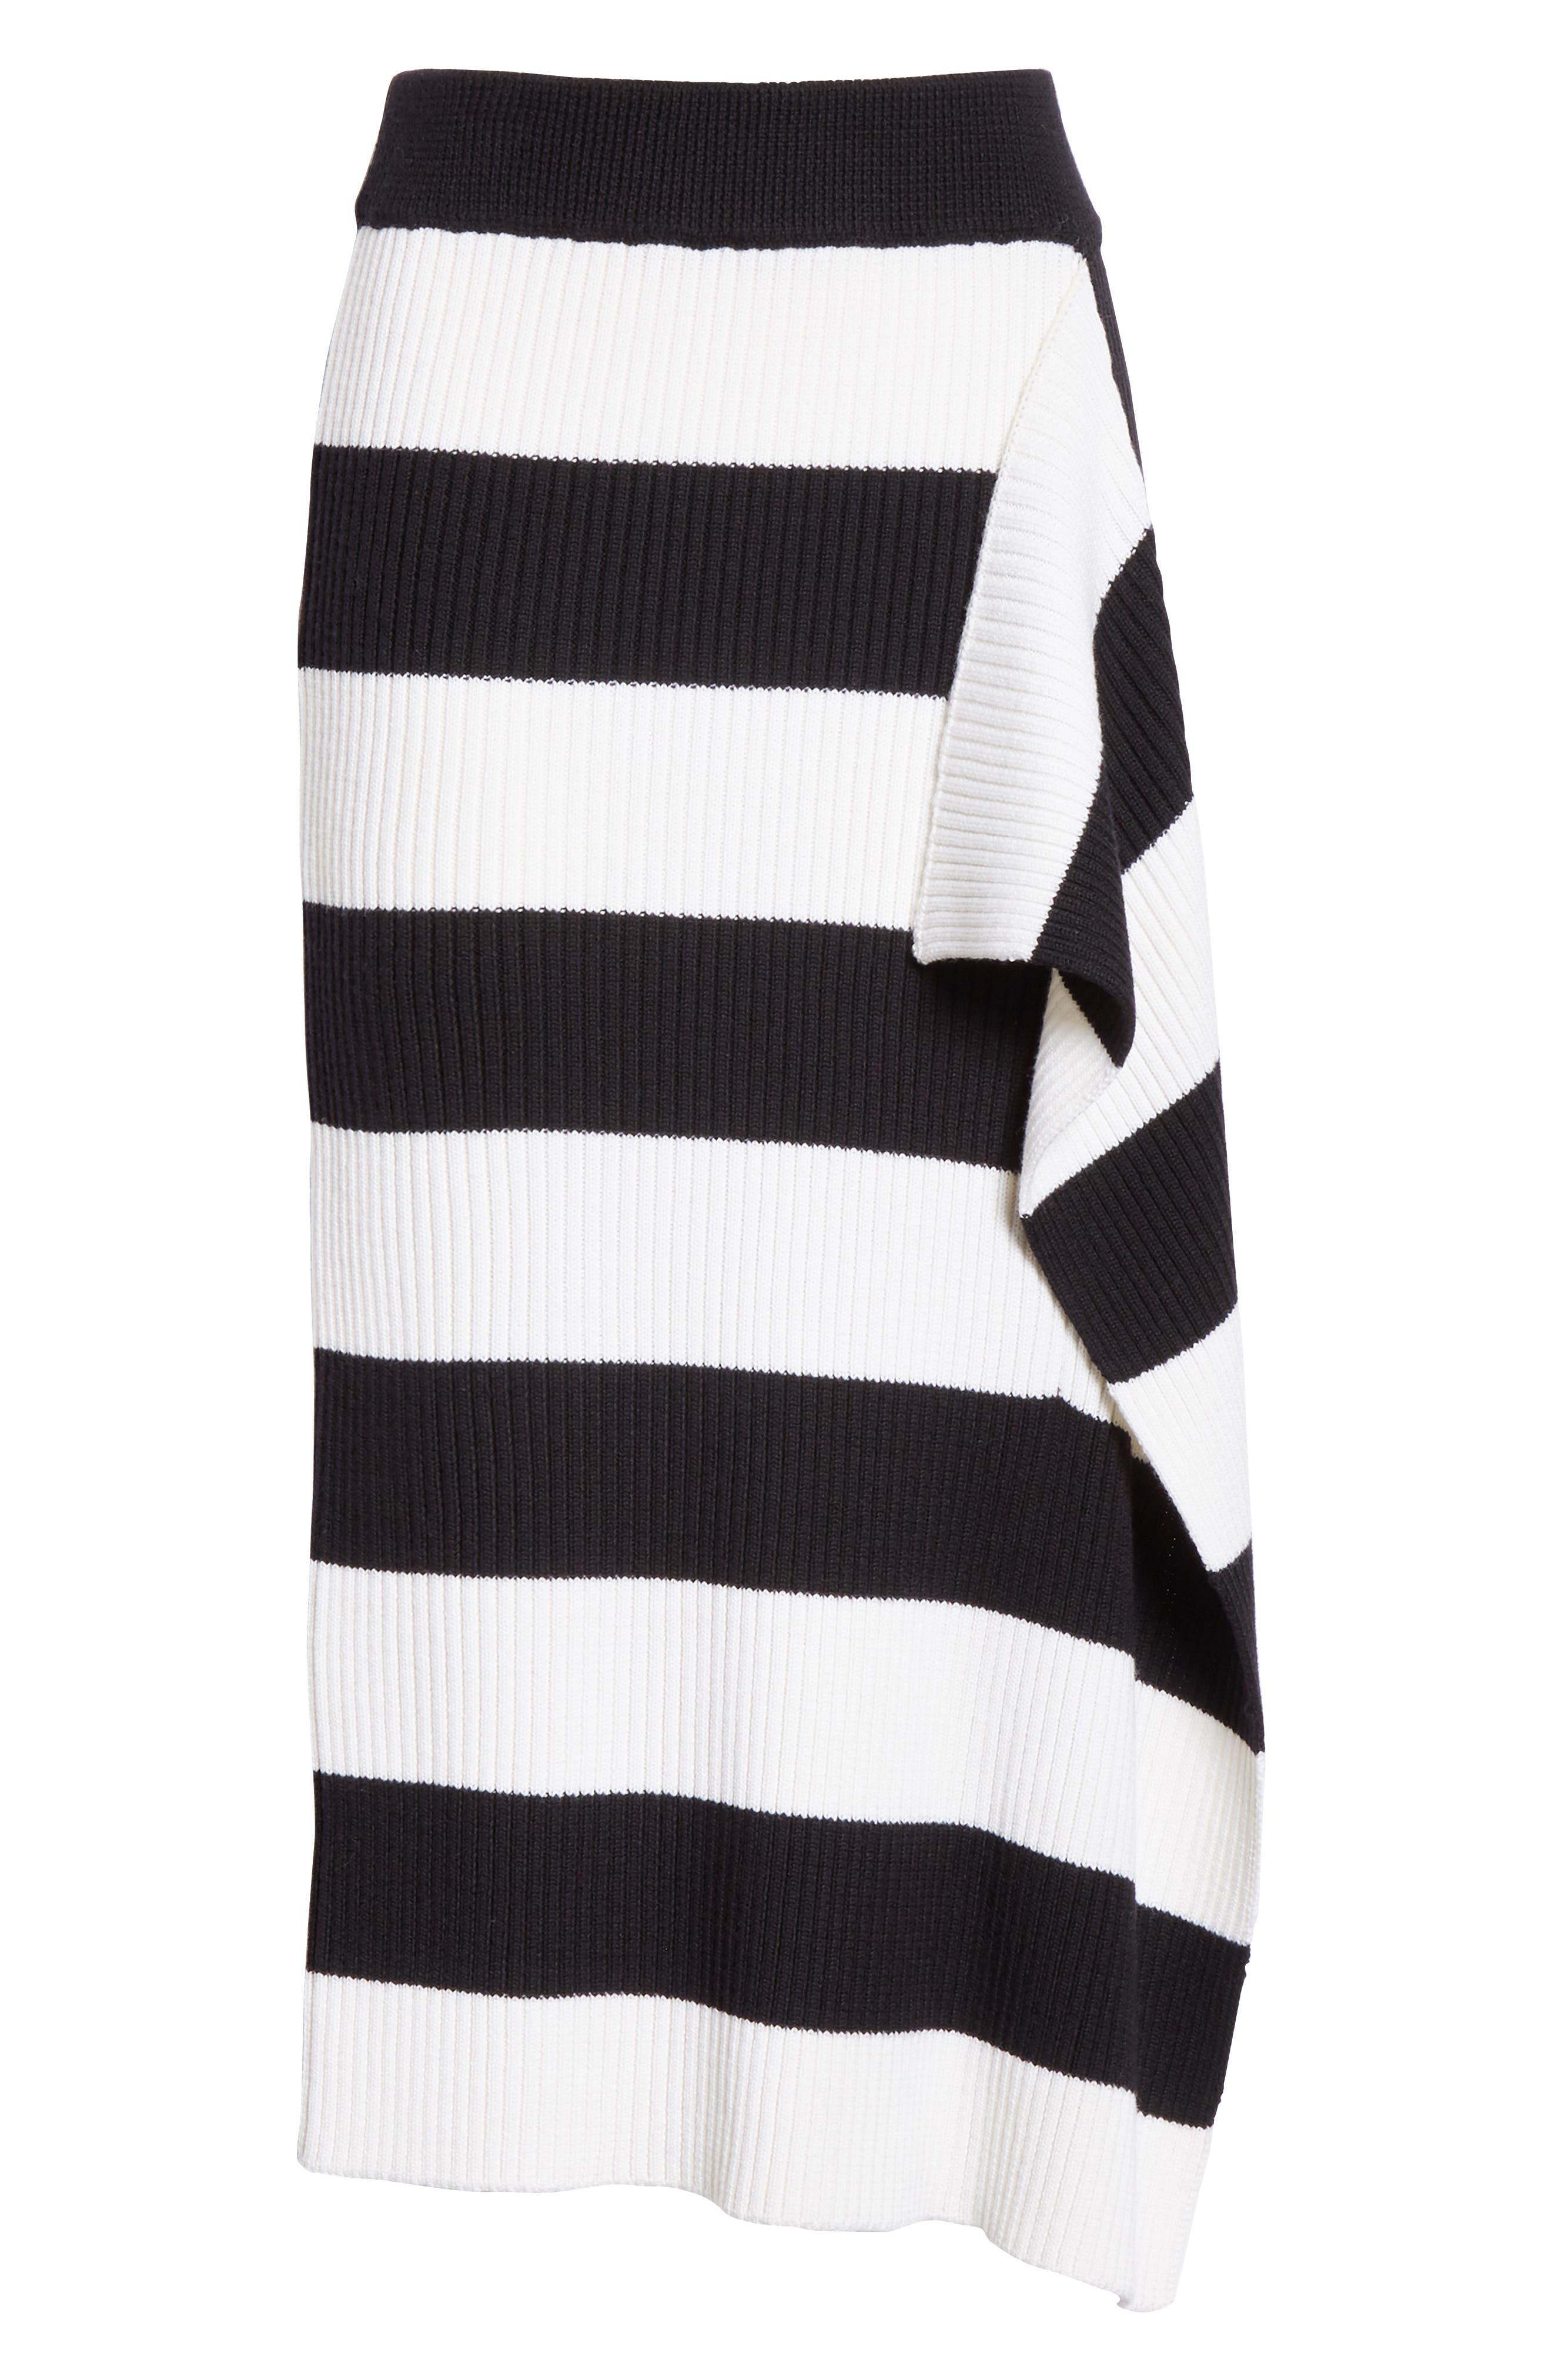 Origami Flap Stripe Midi Skirt,                             Alternate thumbnail 6, color,                             BLACK/ WHITE MULTI